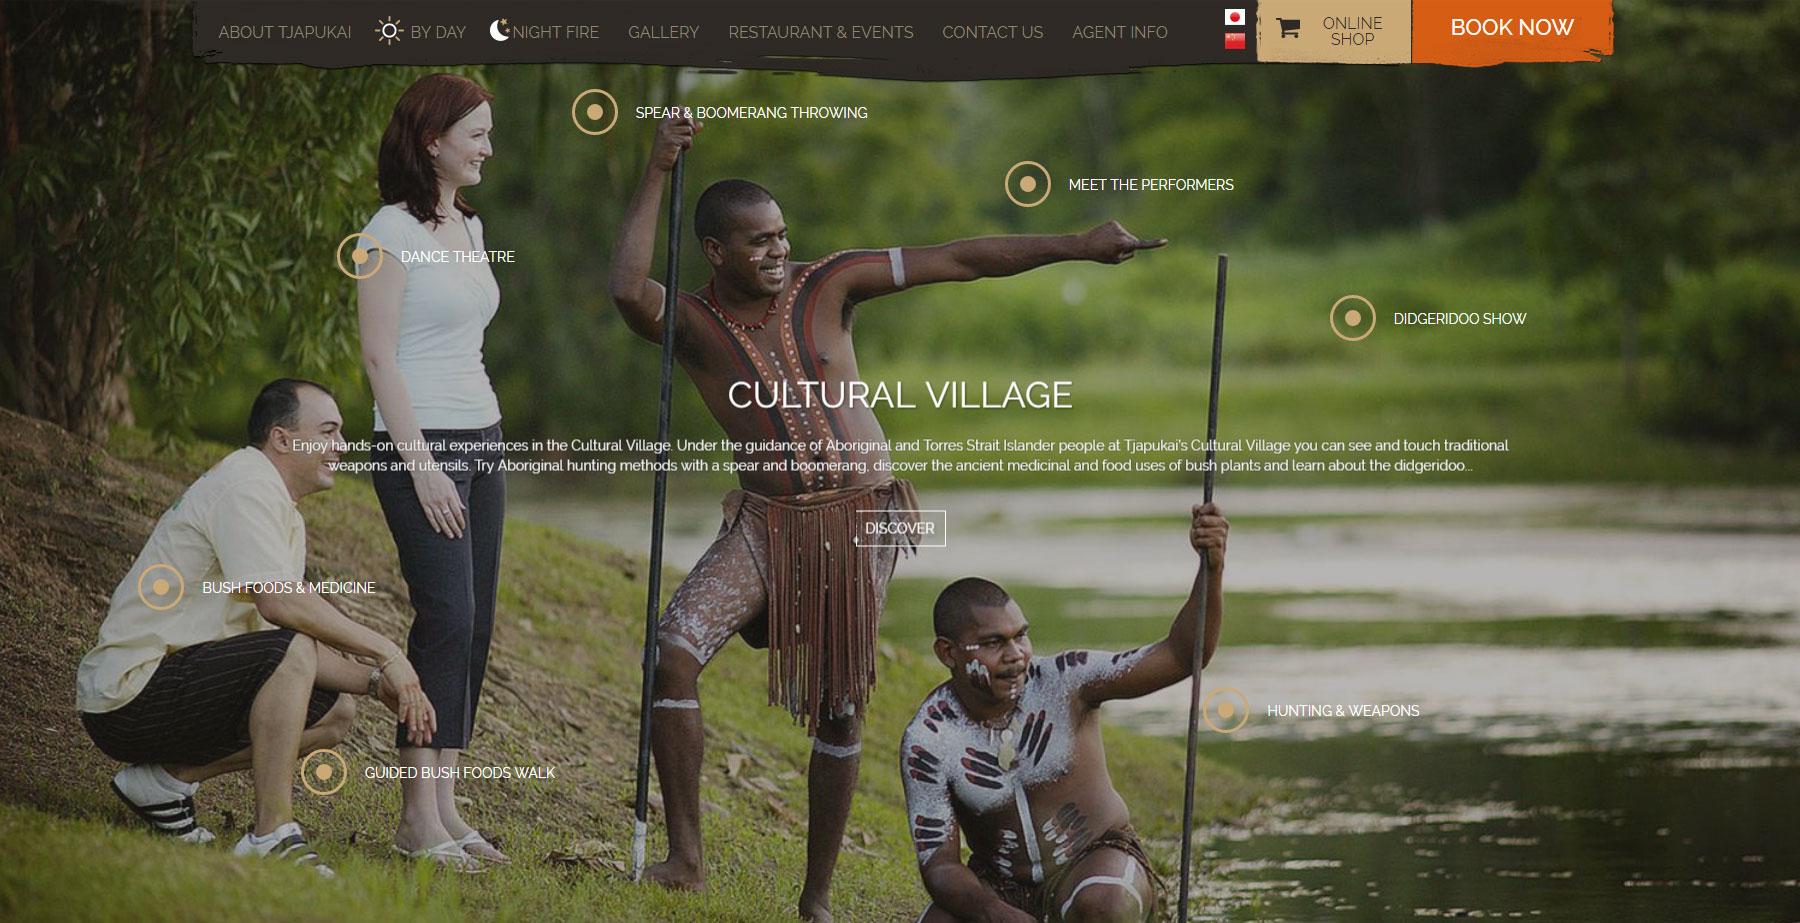 Tjapukai - Website of the Day